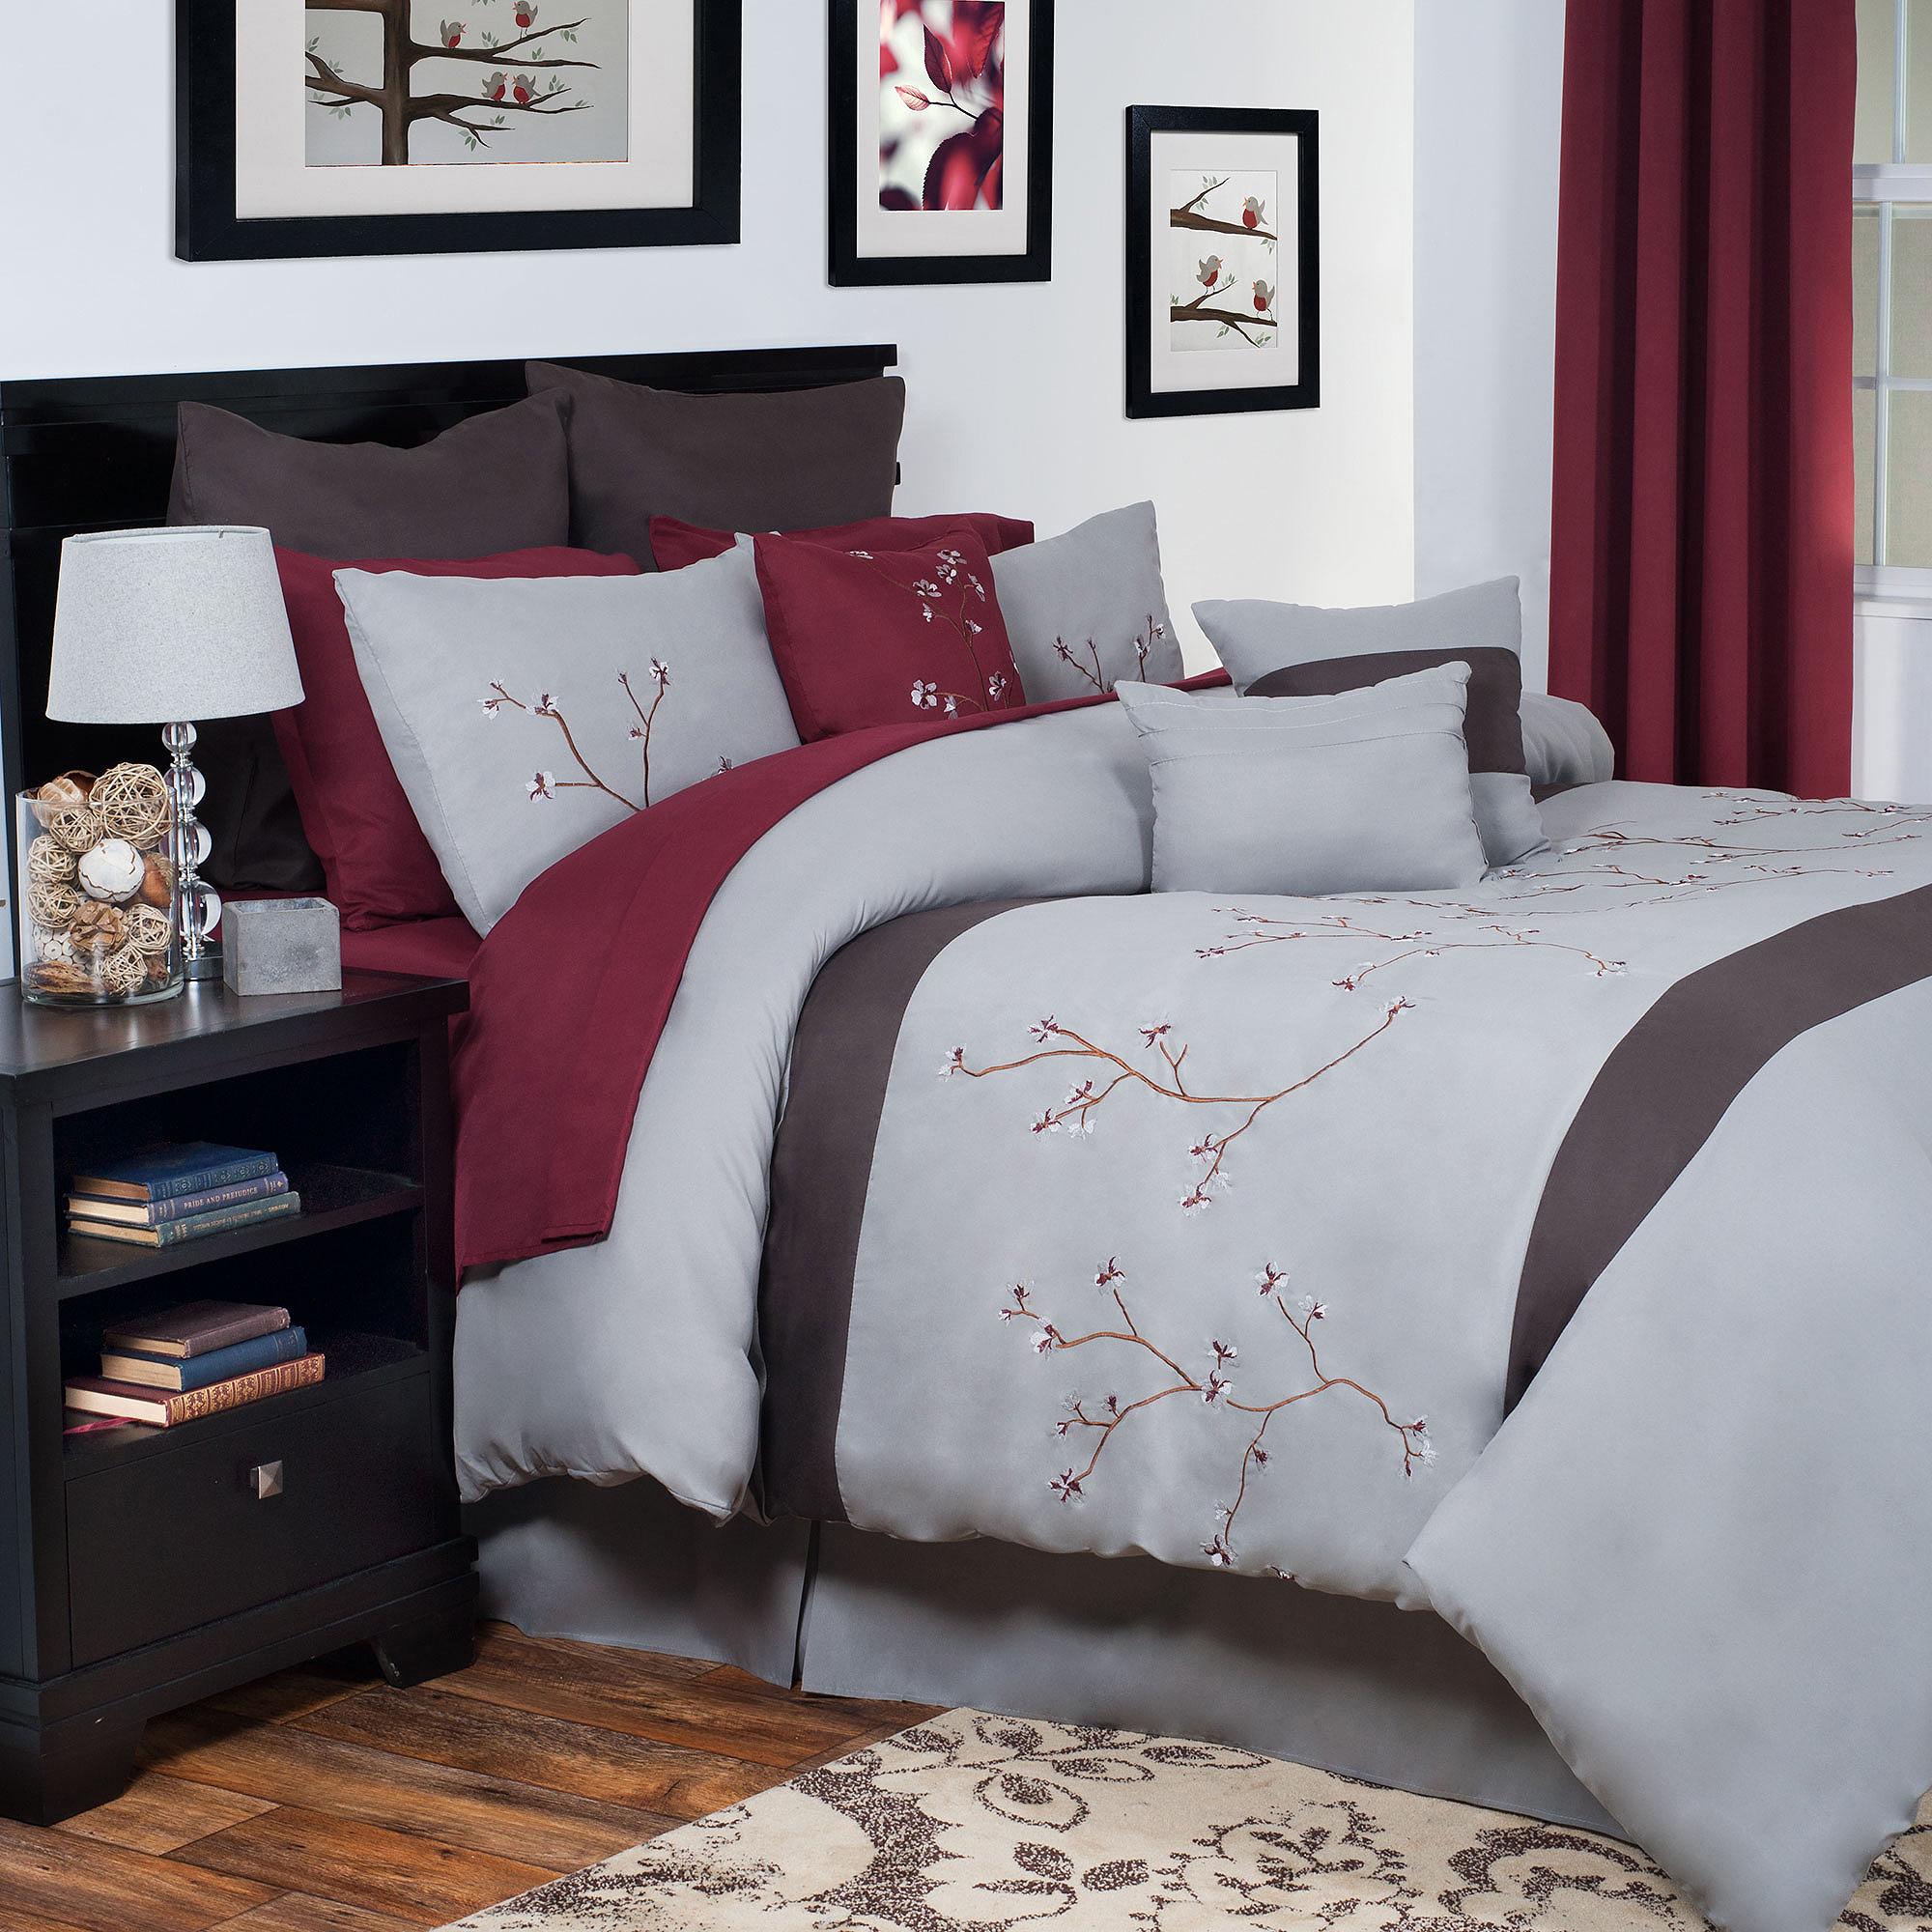 Somerset Home Grace Oversized Embroidered Bedding Comforter Set